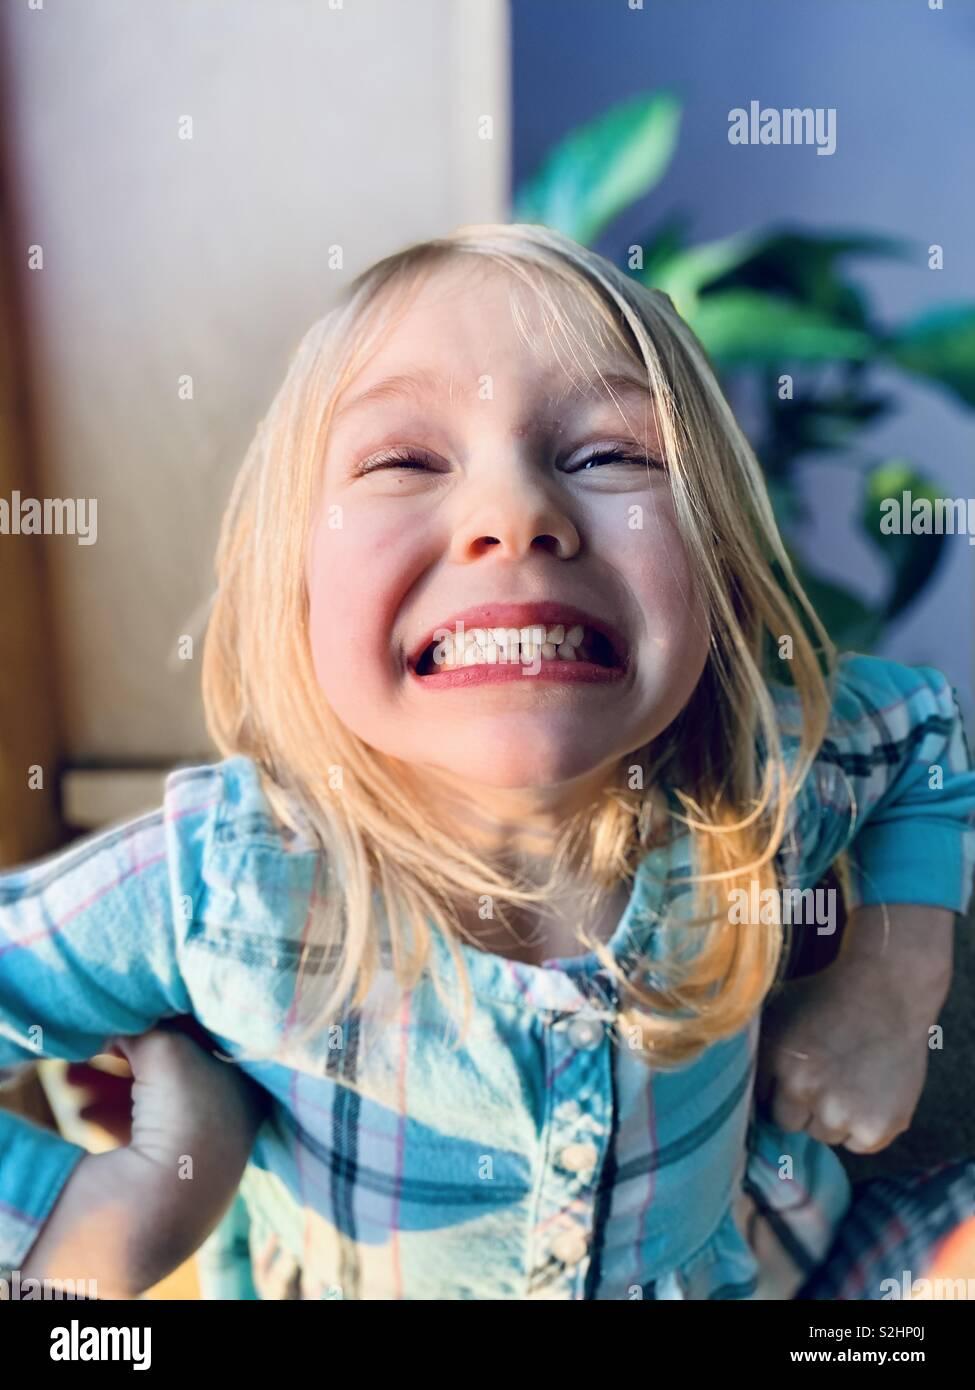 Chica rubia con una gran sonrisa. Foto de stock